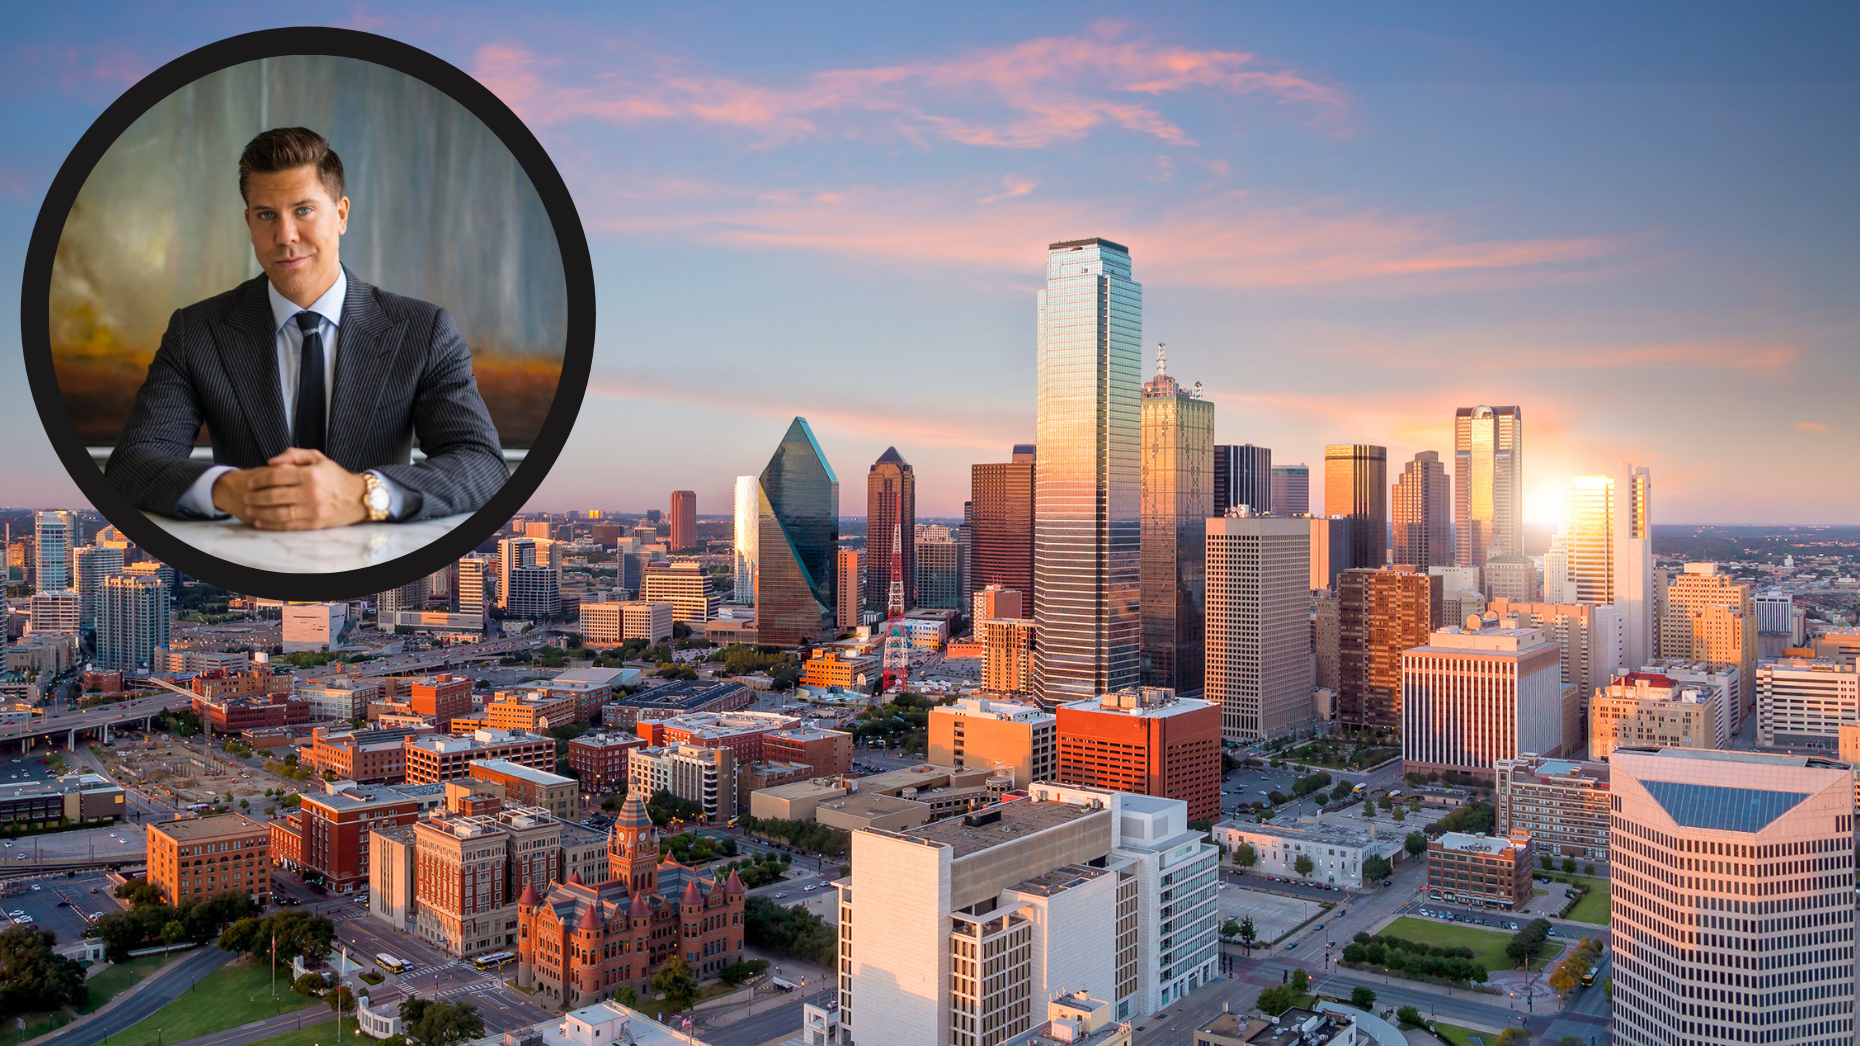 Douglas Elliman expands Texas footprint with Frederik Eklund